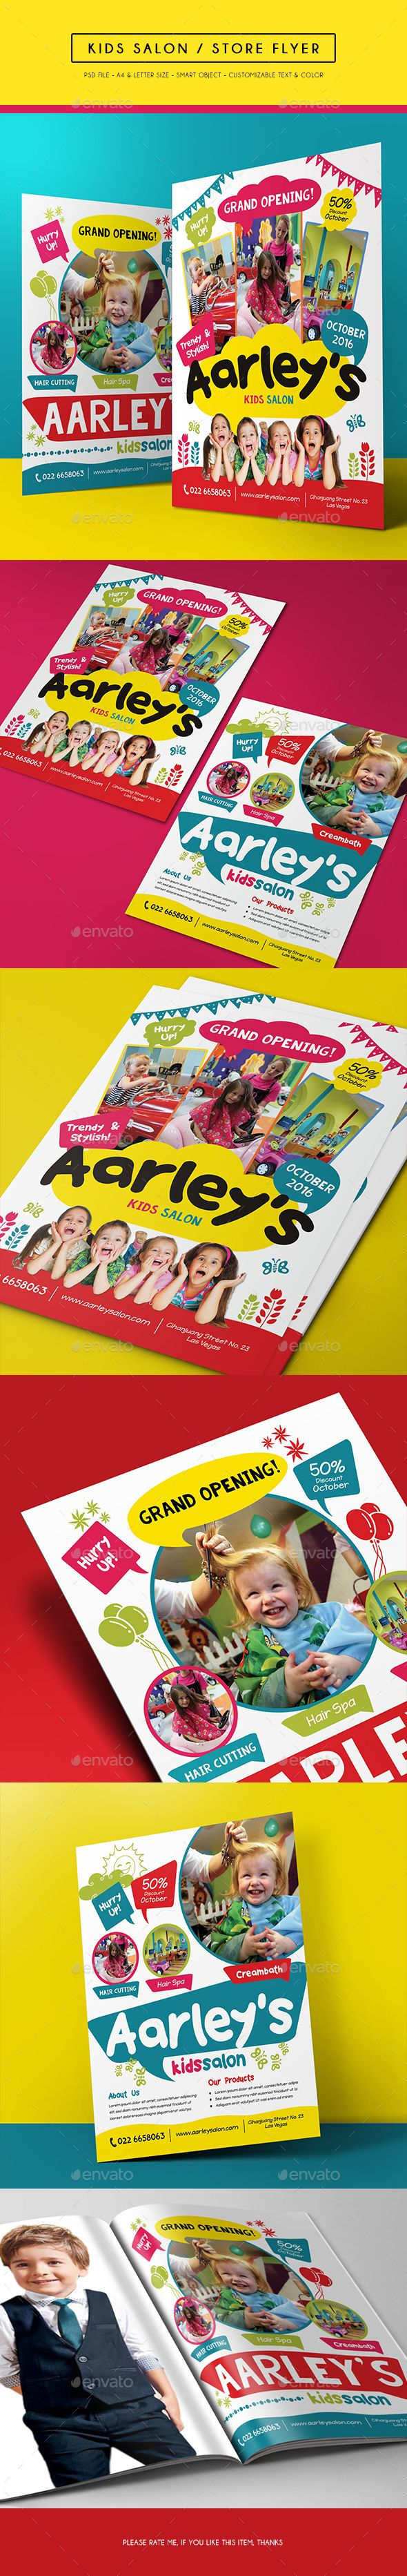 Kids Salon / Store Flyer